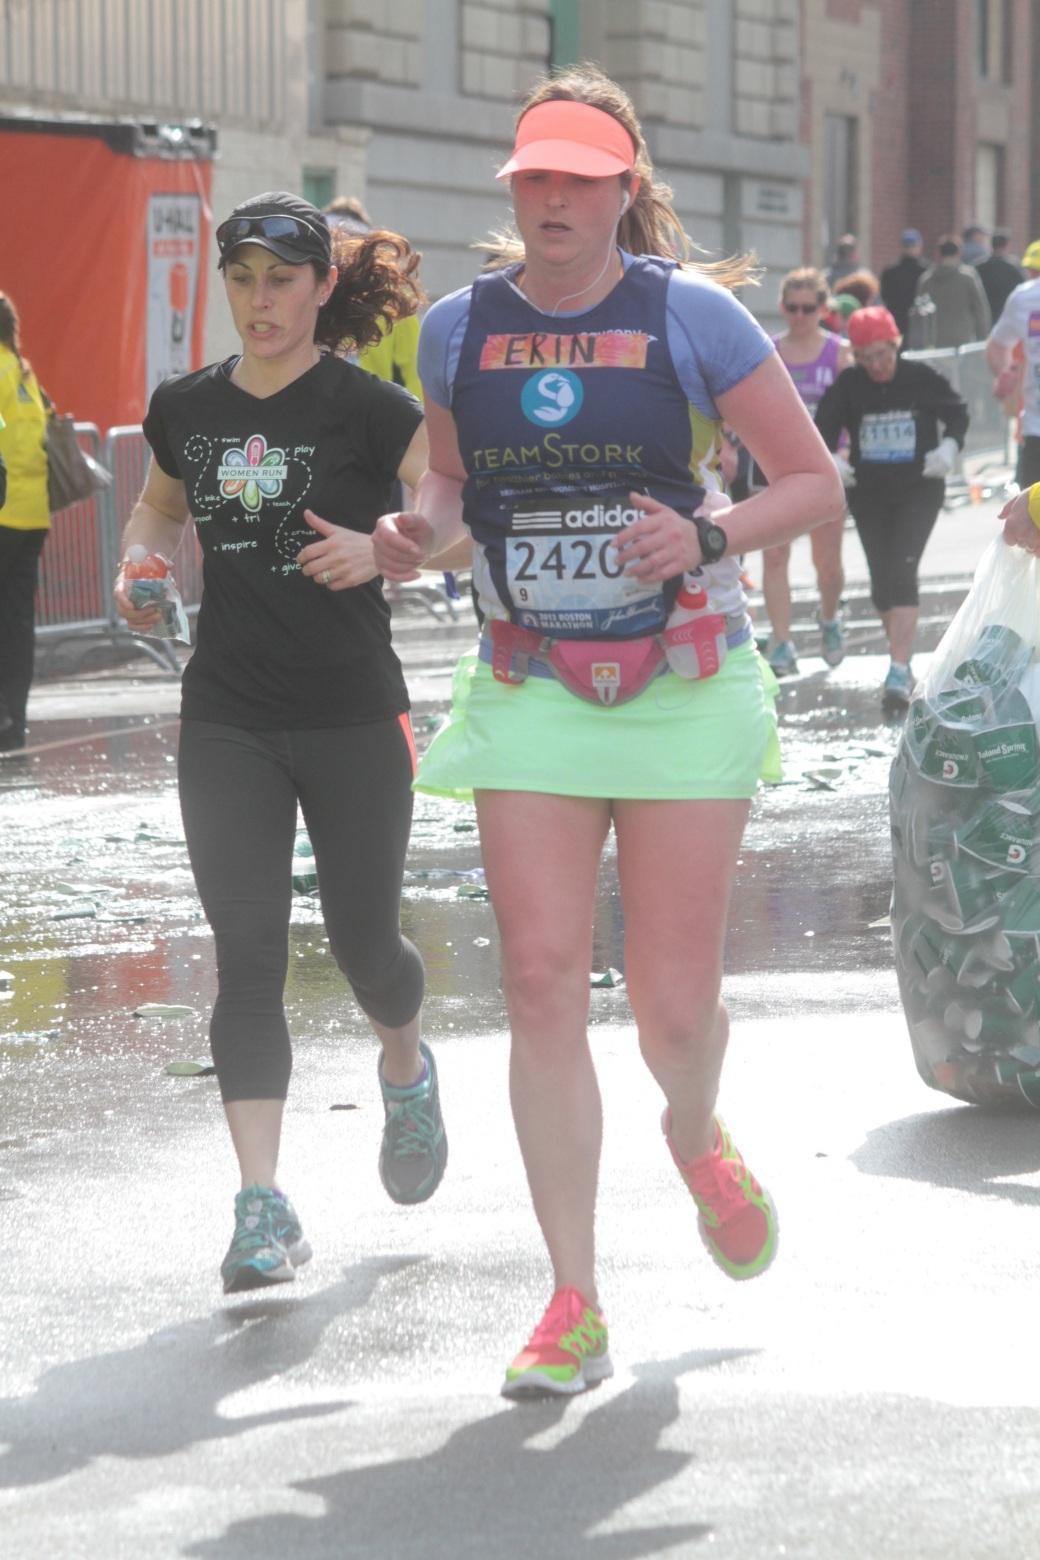 boston marathon 2013 number 24230